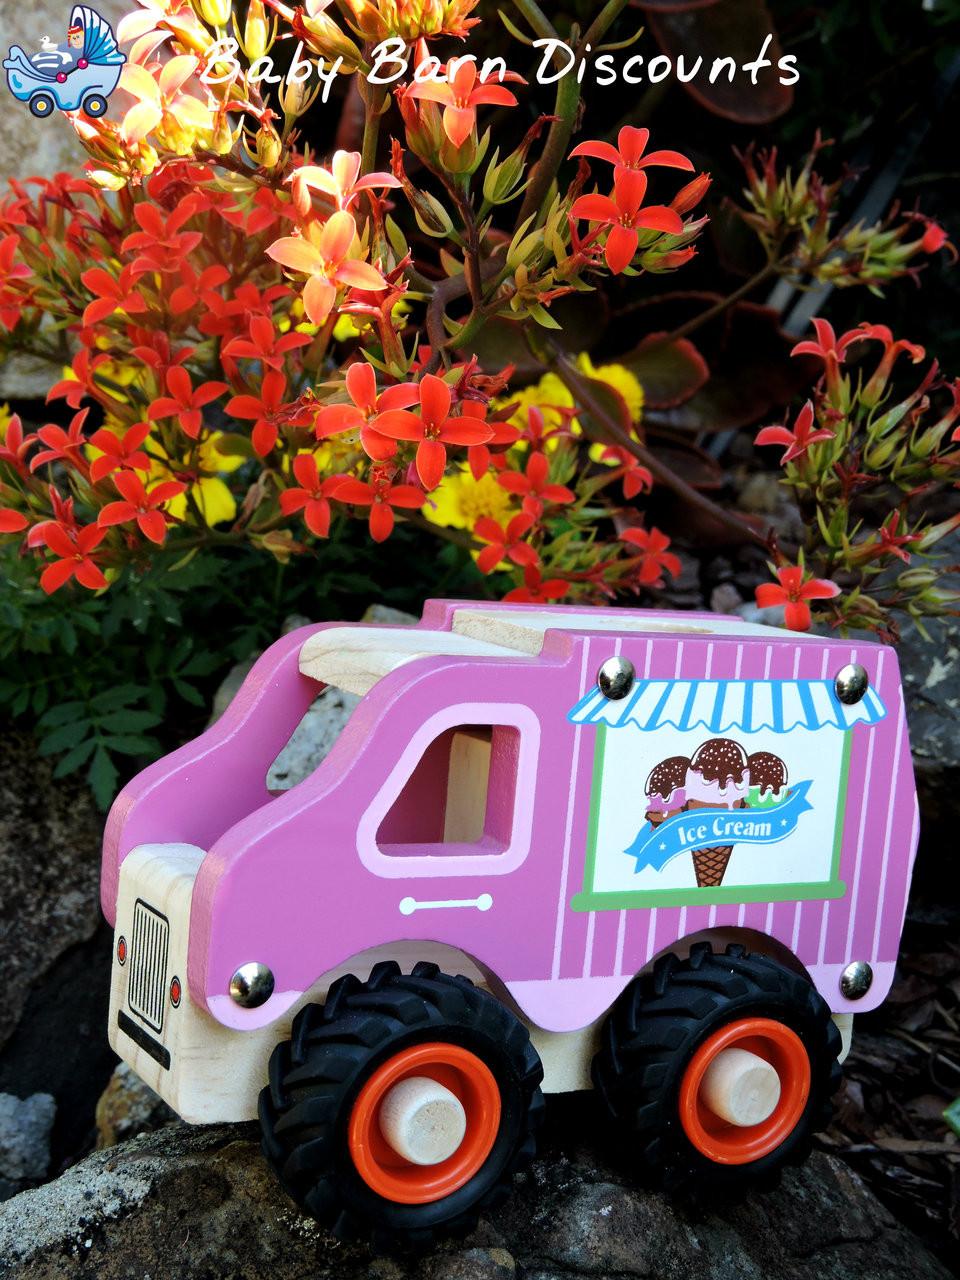 Kaper Kidz Fun Ice Cream Truck with Rubber Wheels